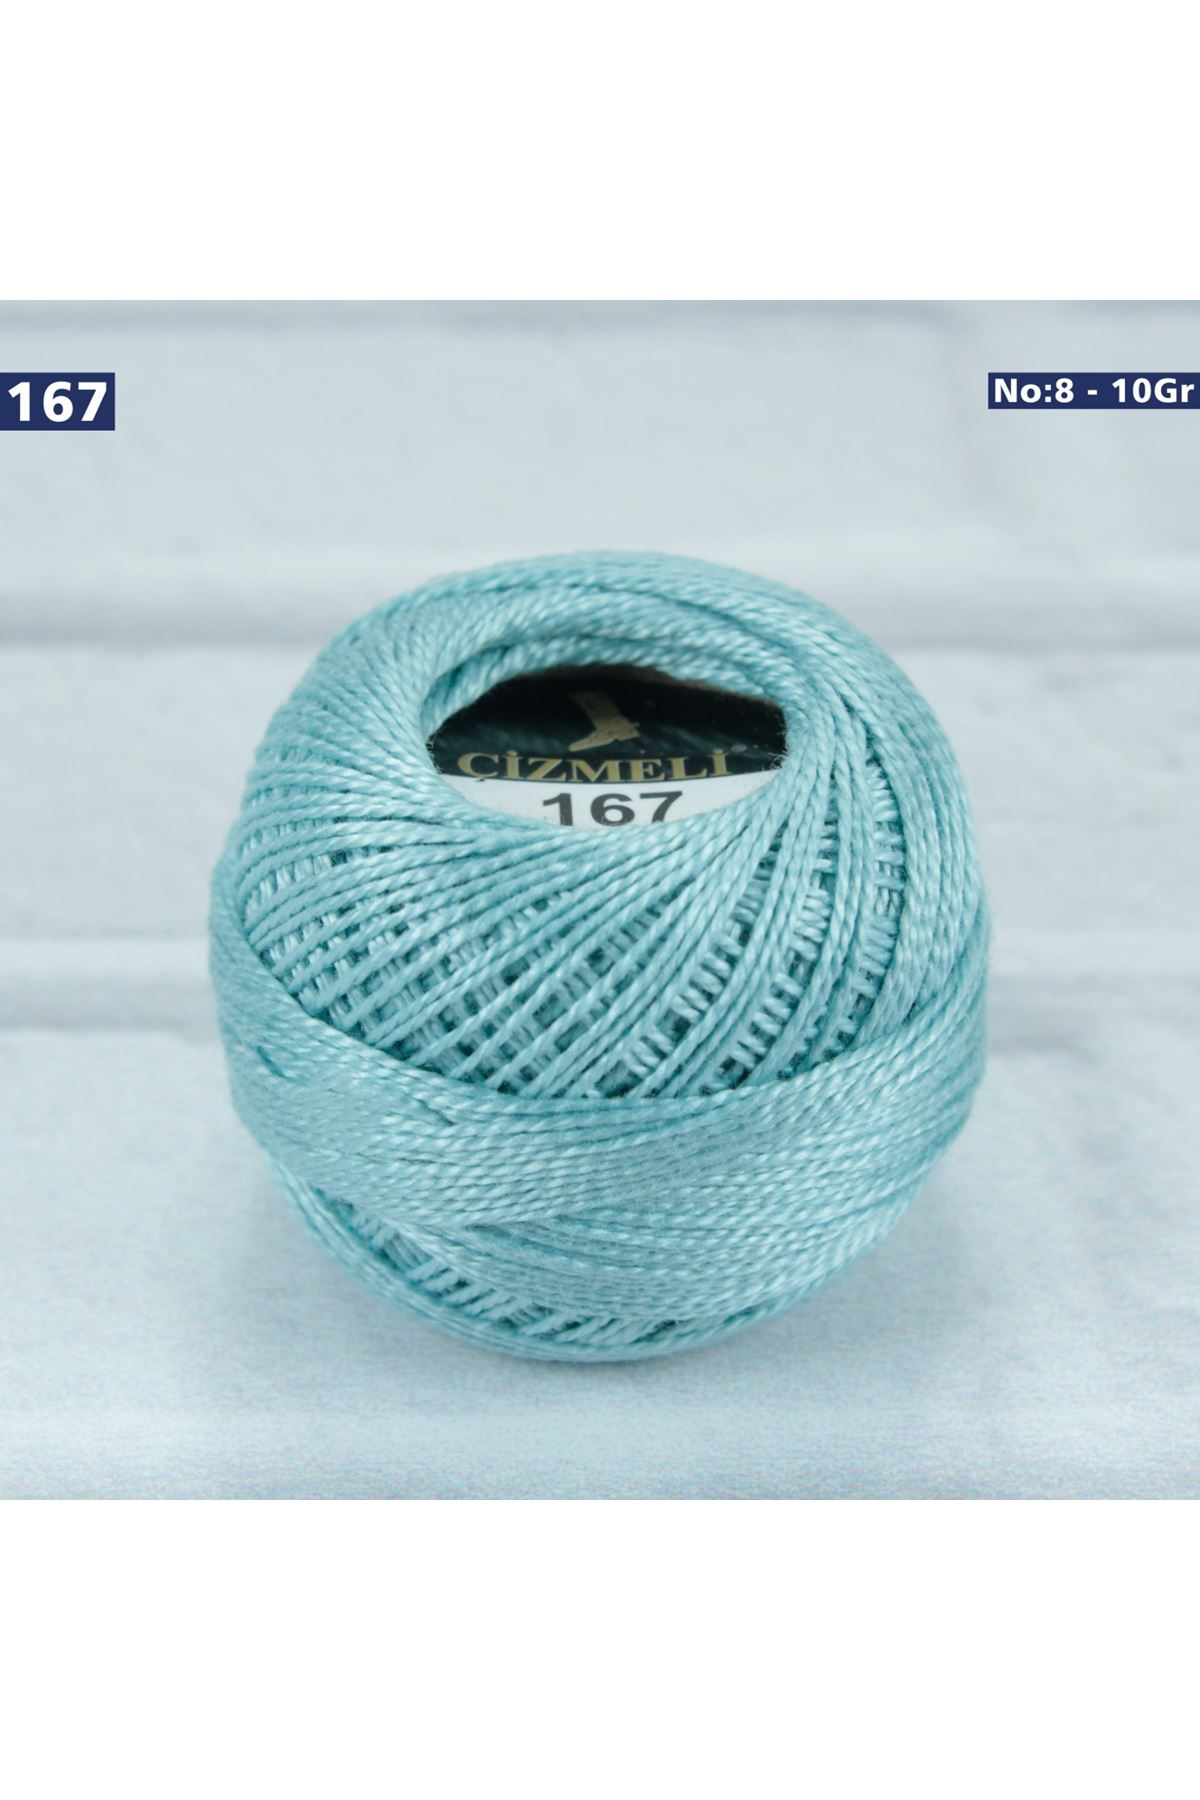 Çizmeli Cotton Perle Nakış İpliği No: 167